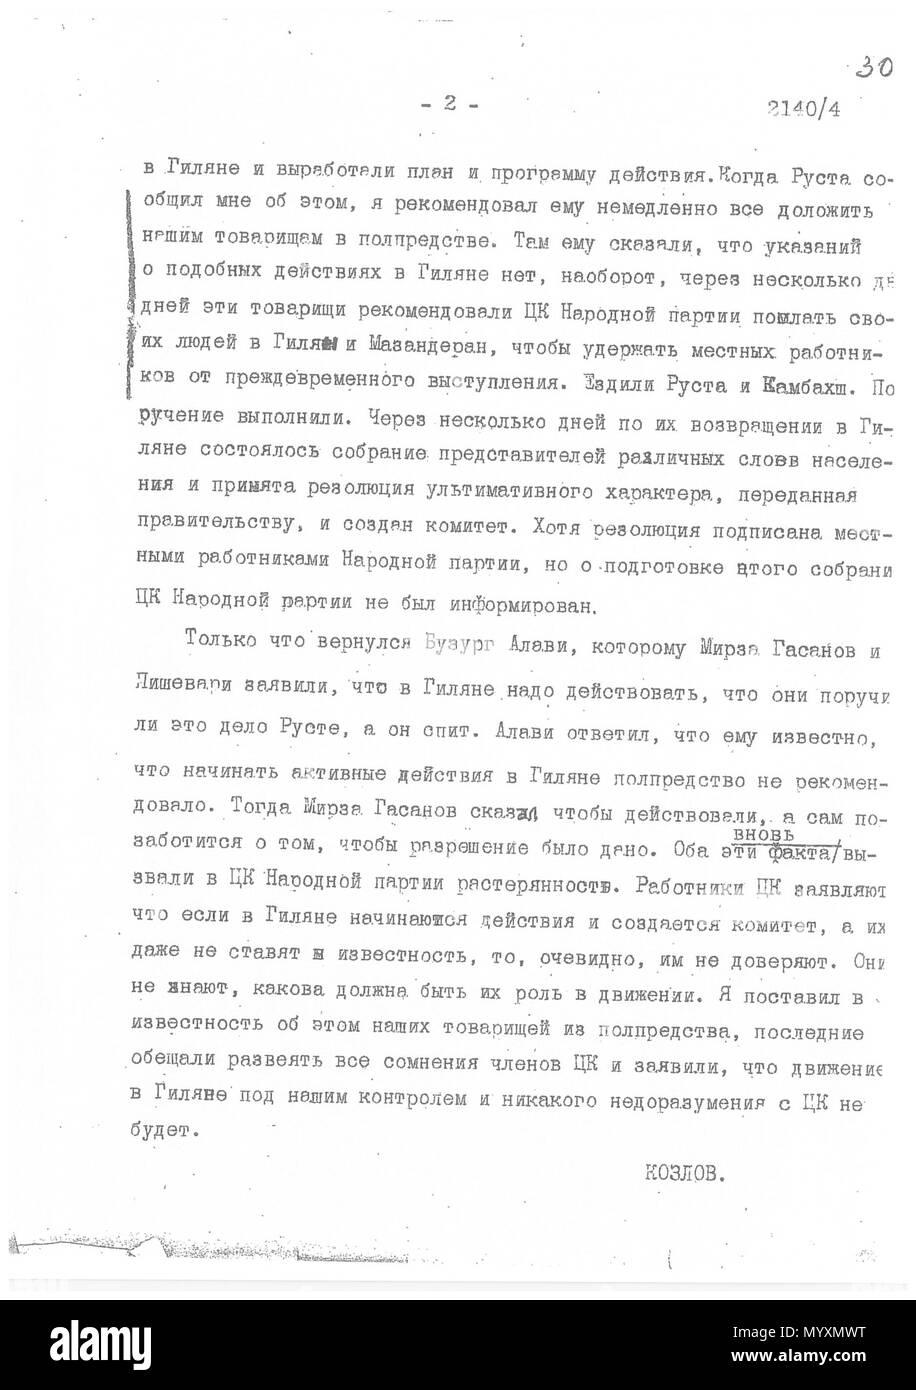 English: Letter from Soviet embassy in Tehran to Soviet